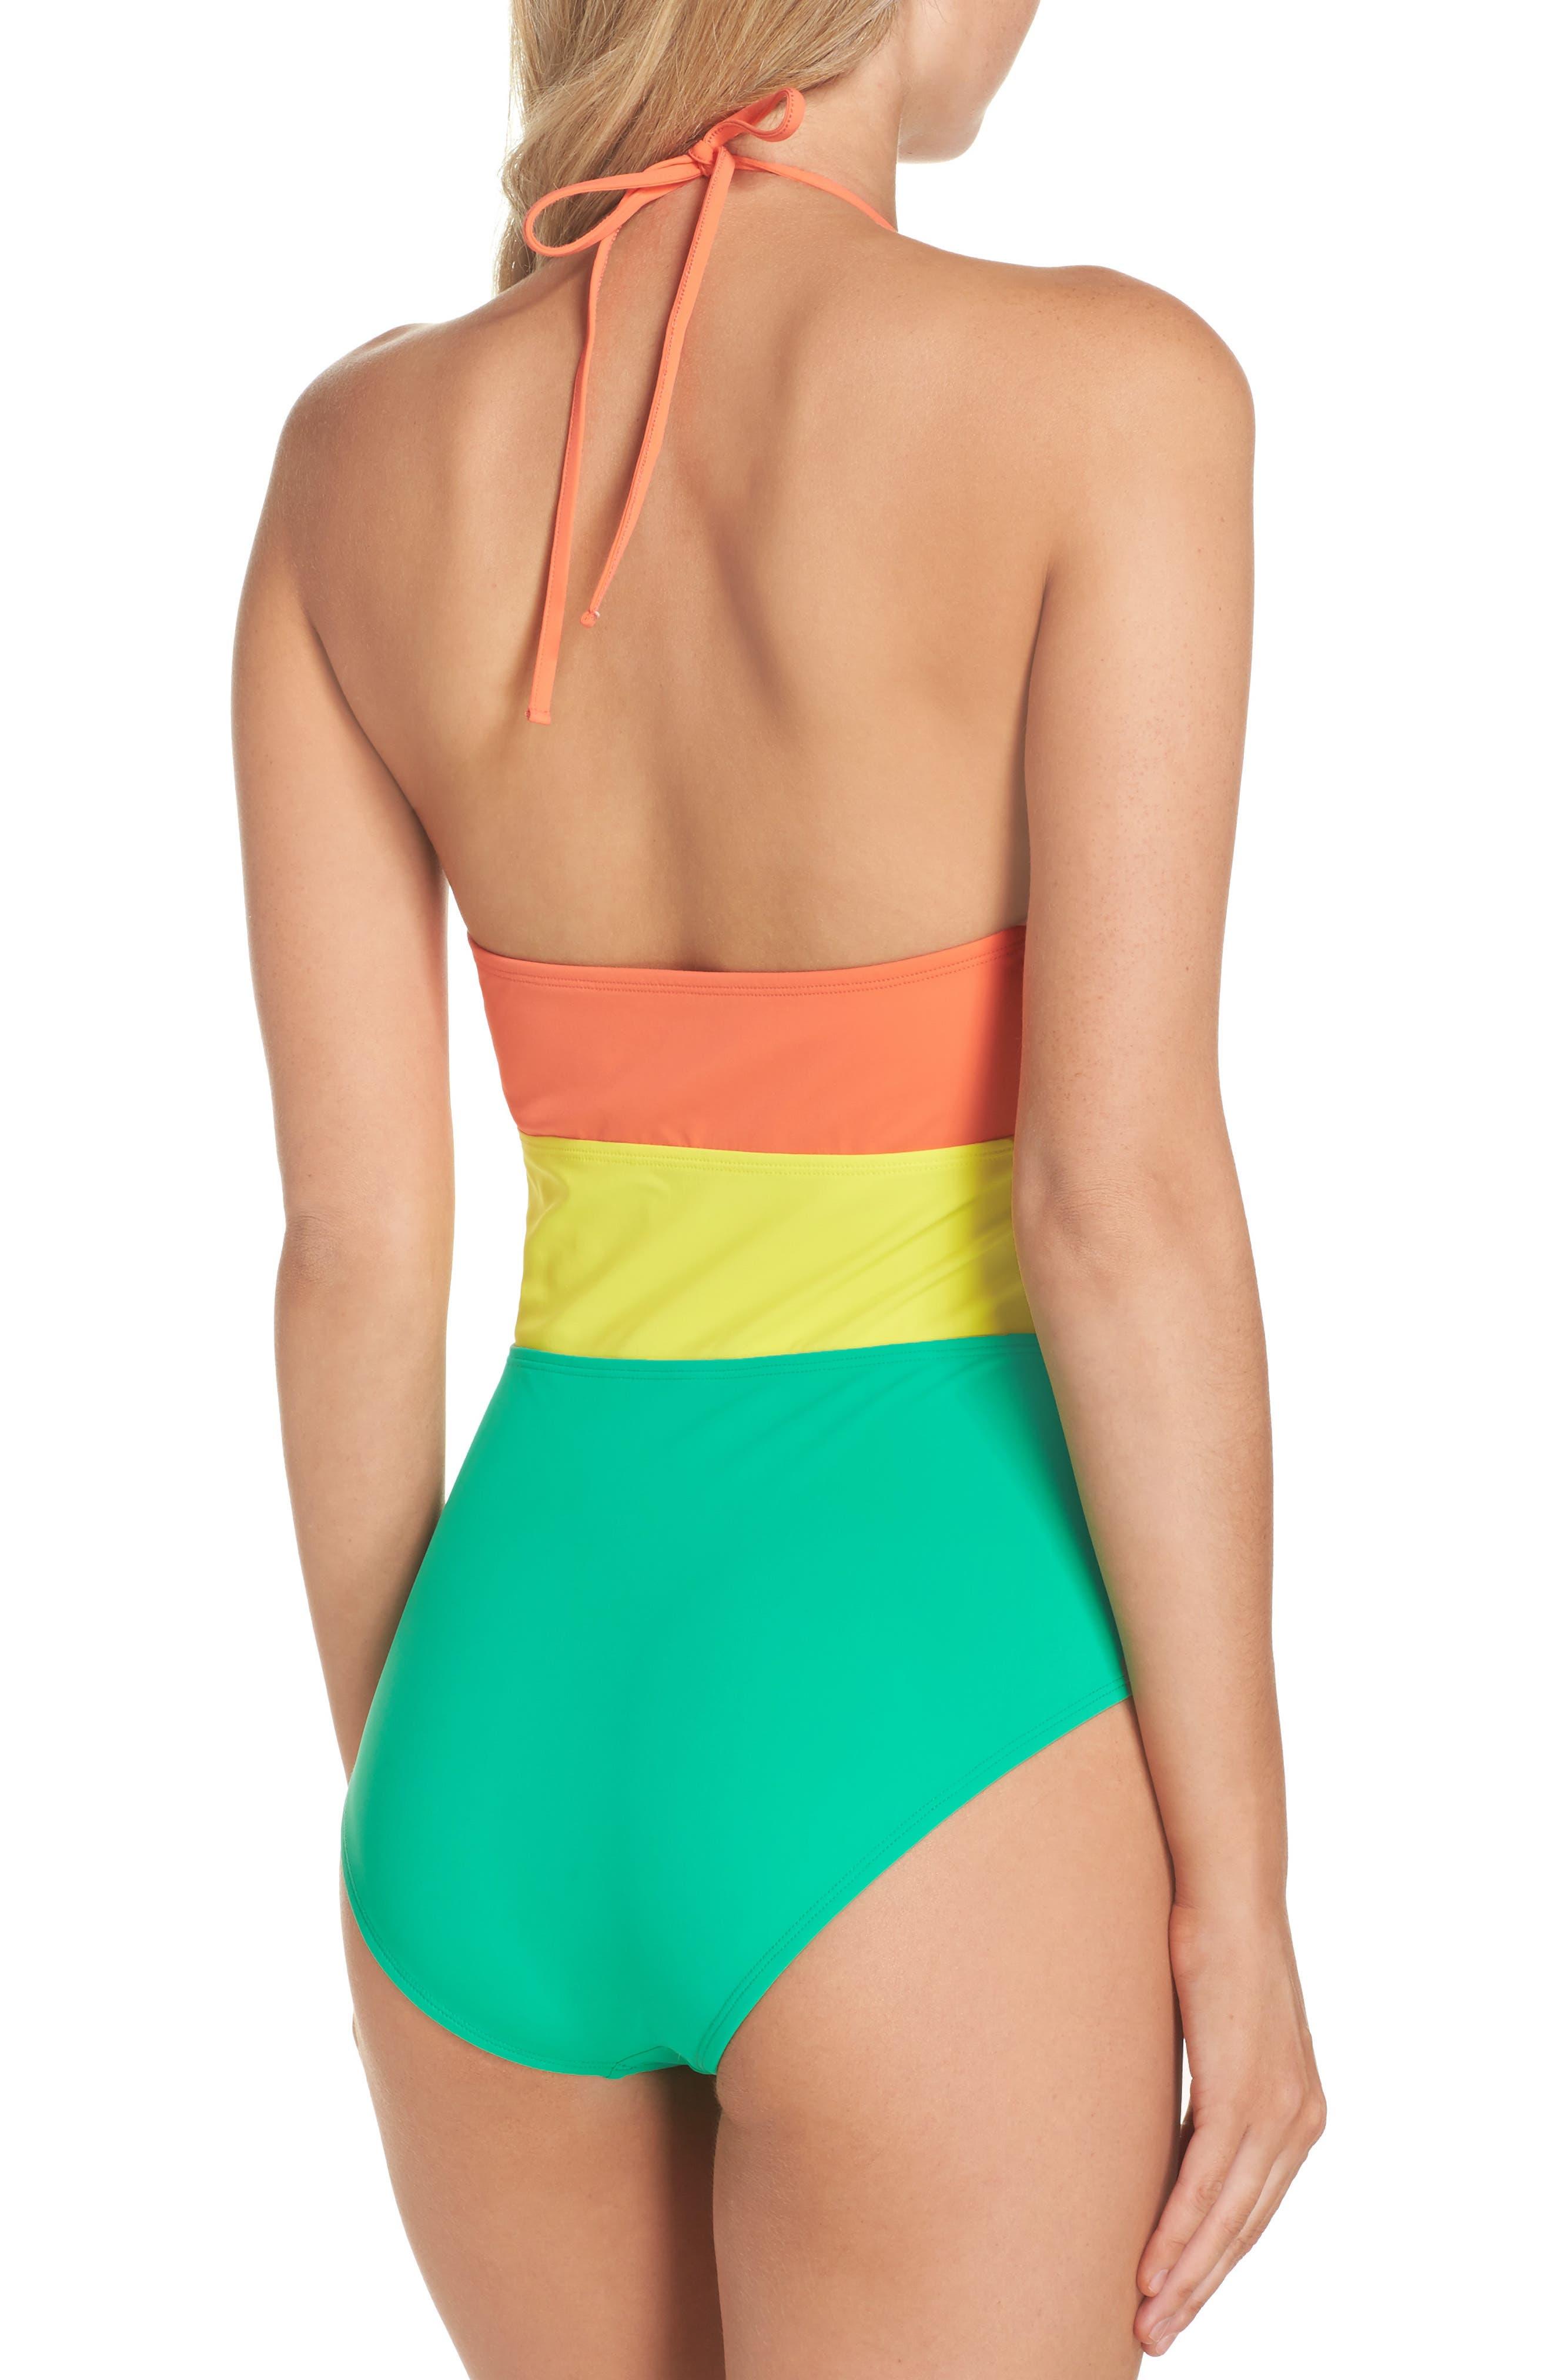 Halter One-Piece Swimsuit,                             Alternate thumbnail 2, color,                             Coral/ Acid